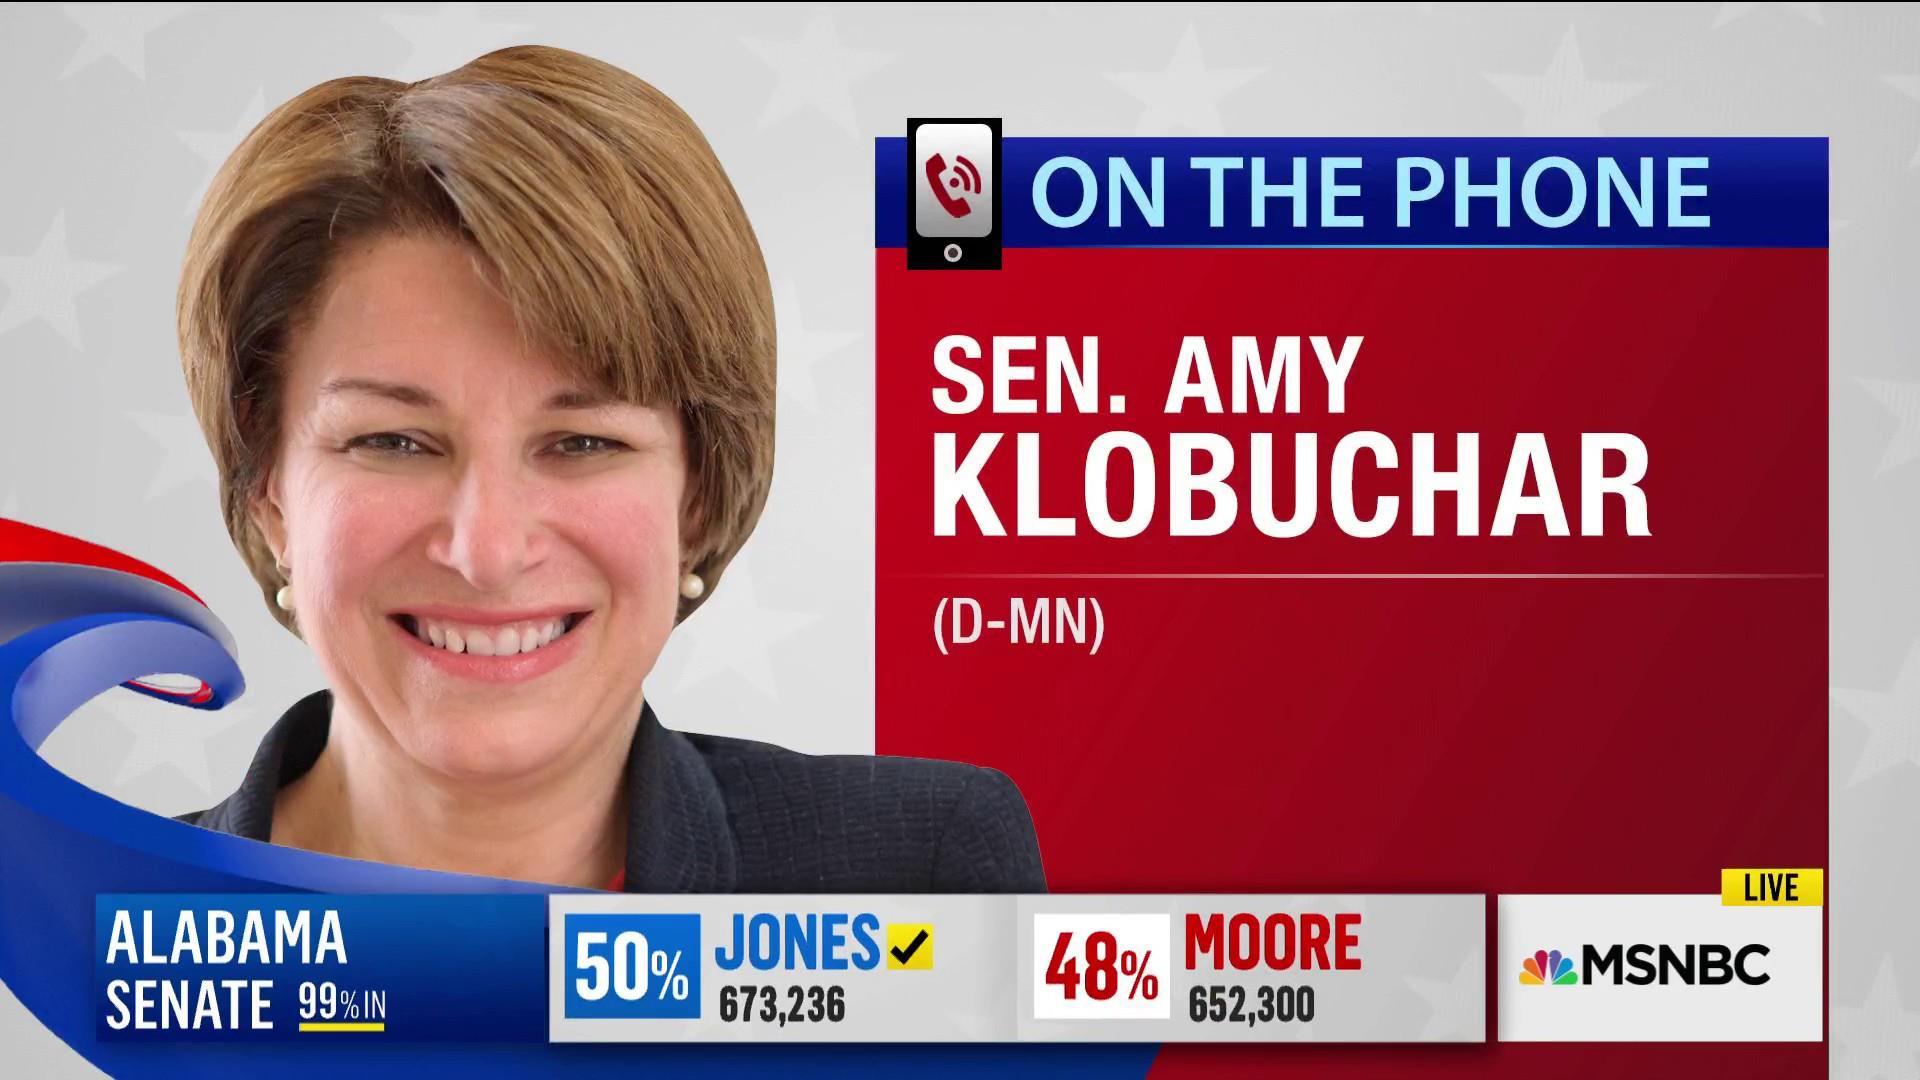 Sen. Amy Klobuchar: 'The people of Alabama have spoken'